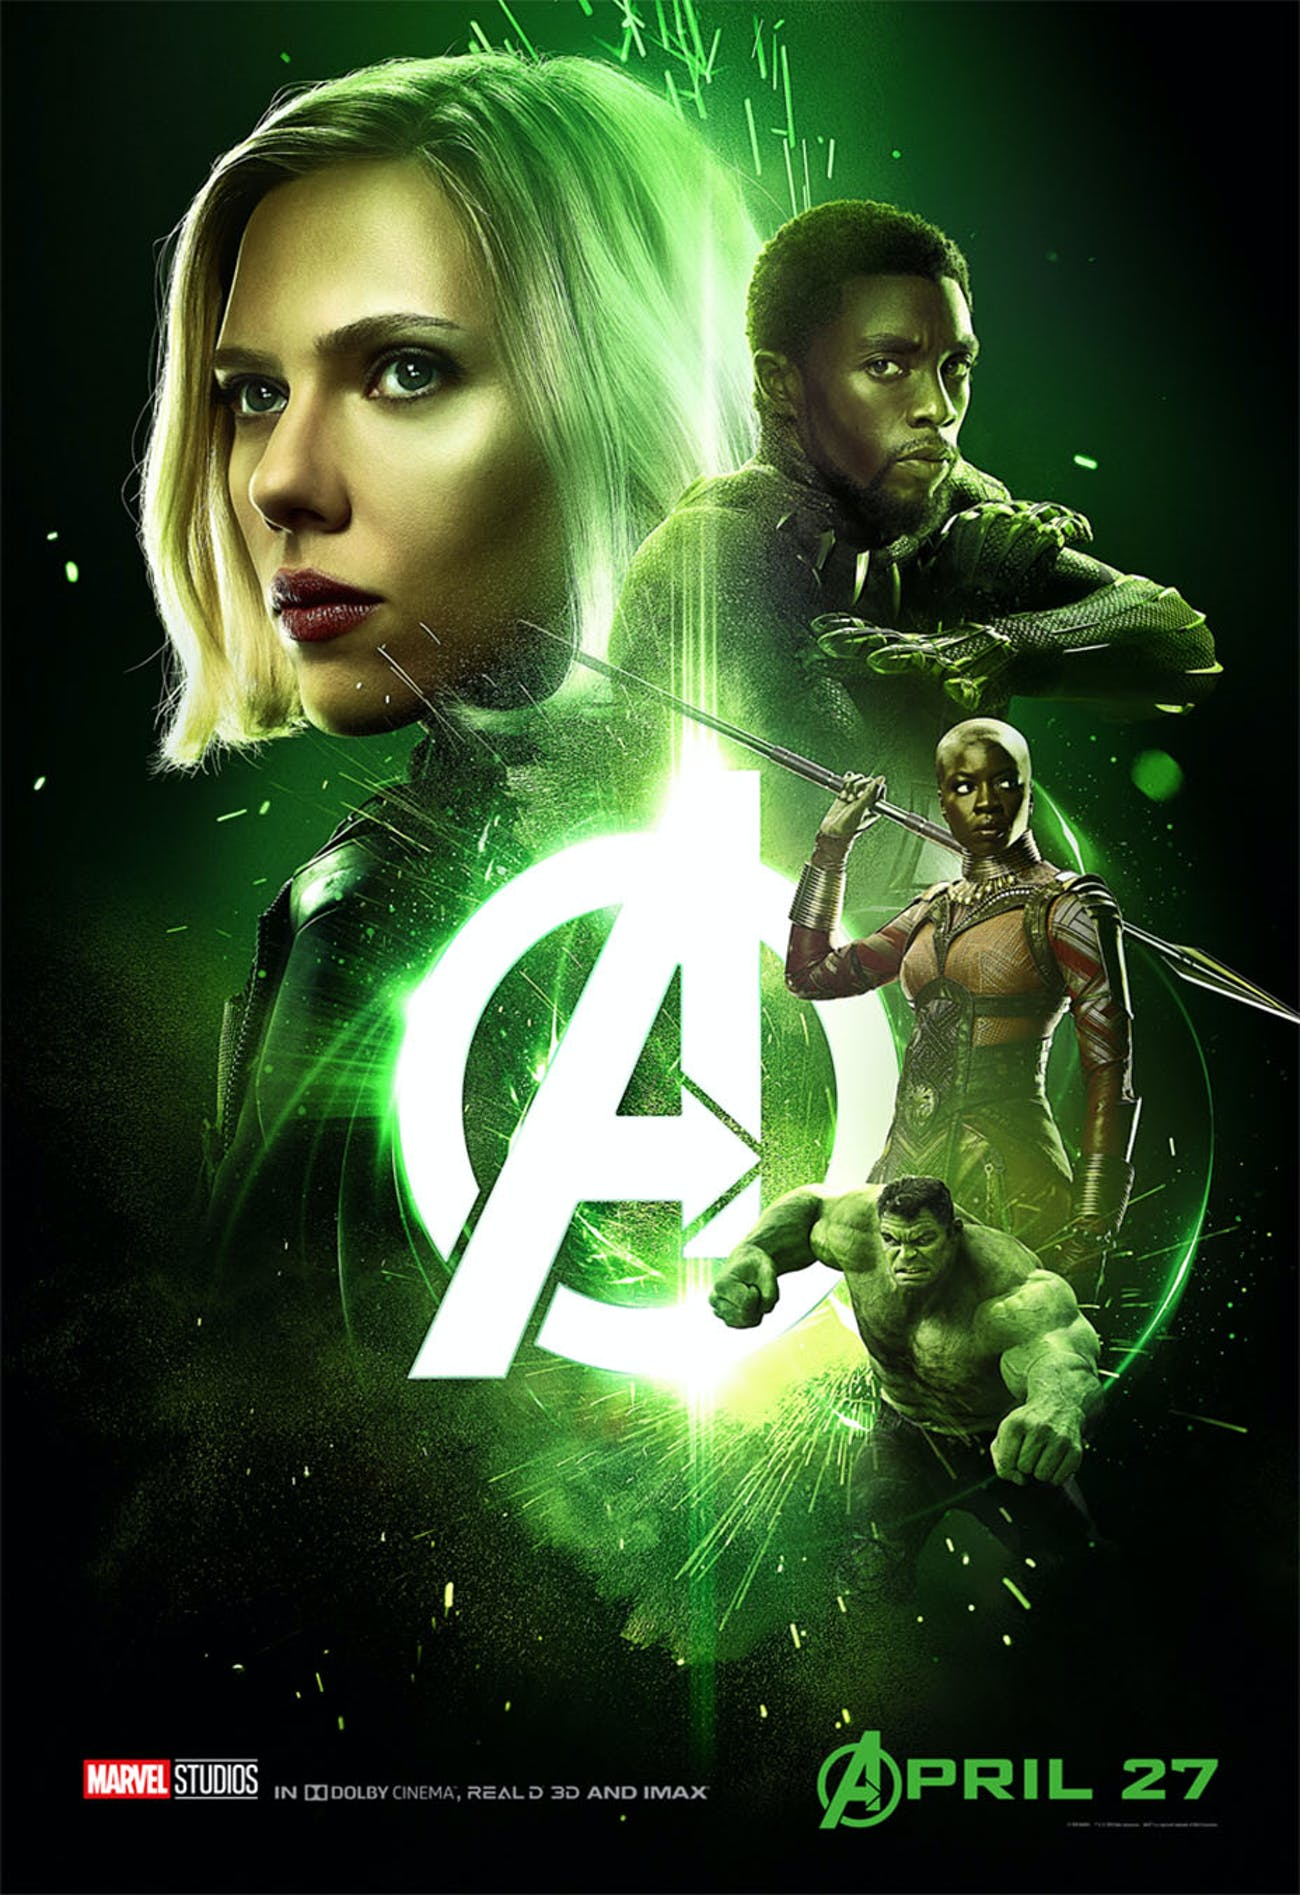 Green 'Infinity War' poster has Black Widow, Black Panther, Okoye, and Hulk.